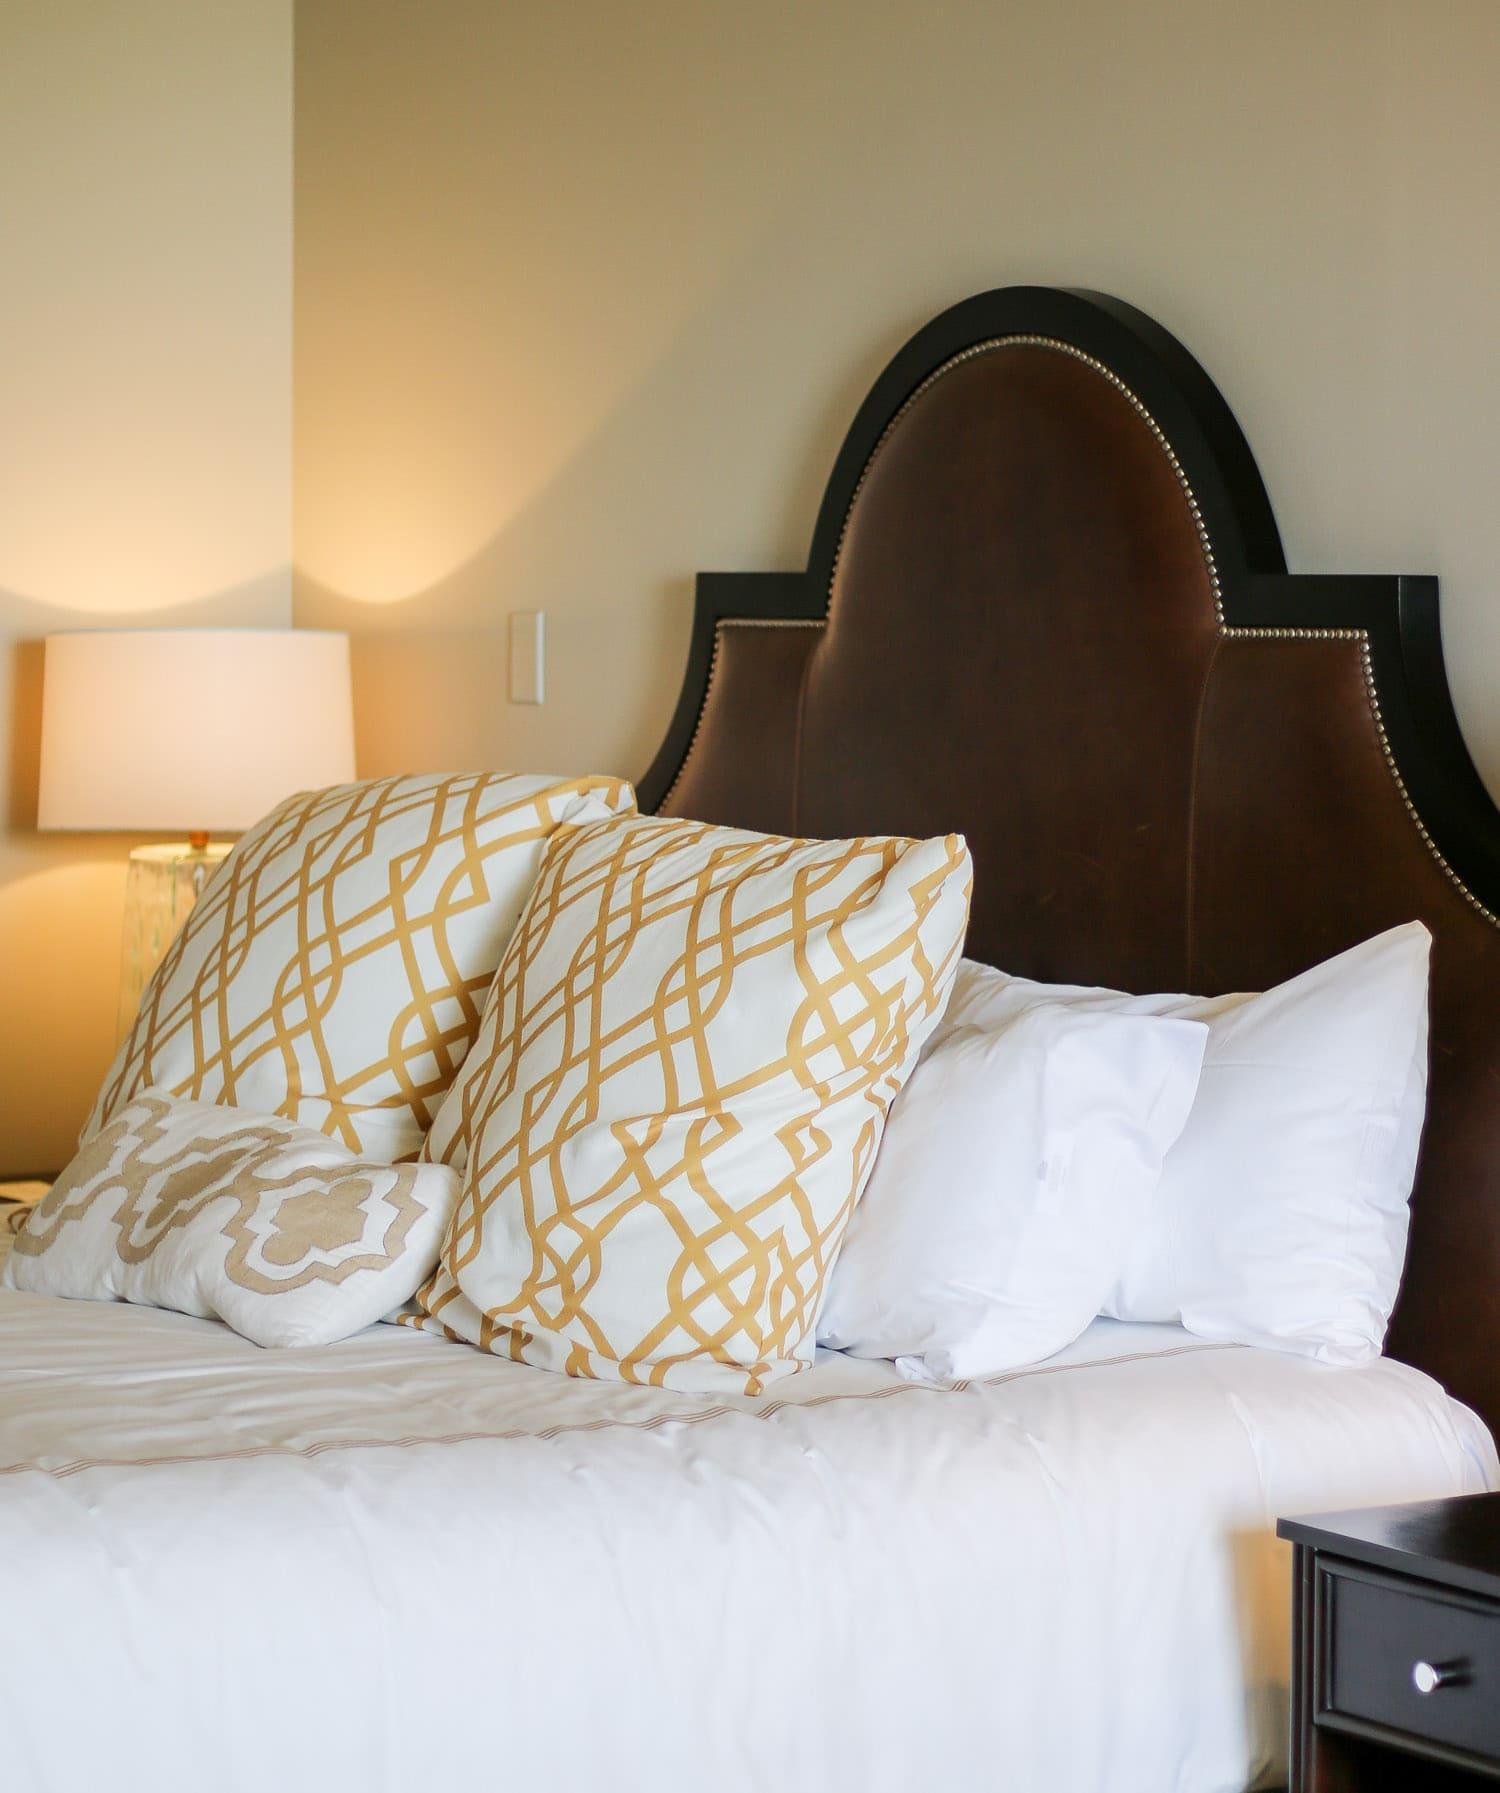 the-pearl-hotel-rosemary-beach-florida-0415